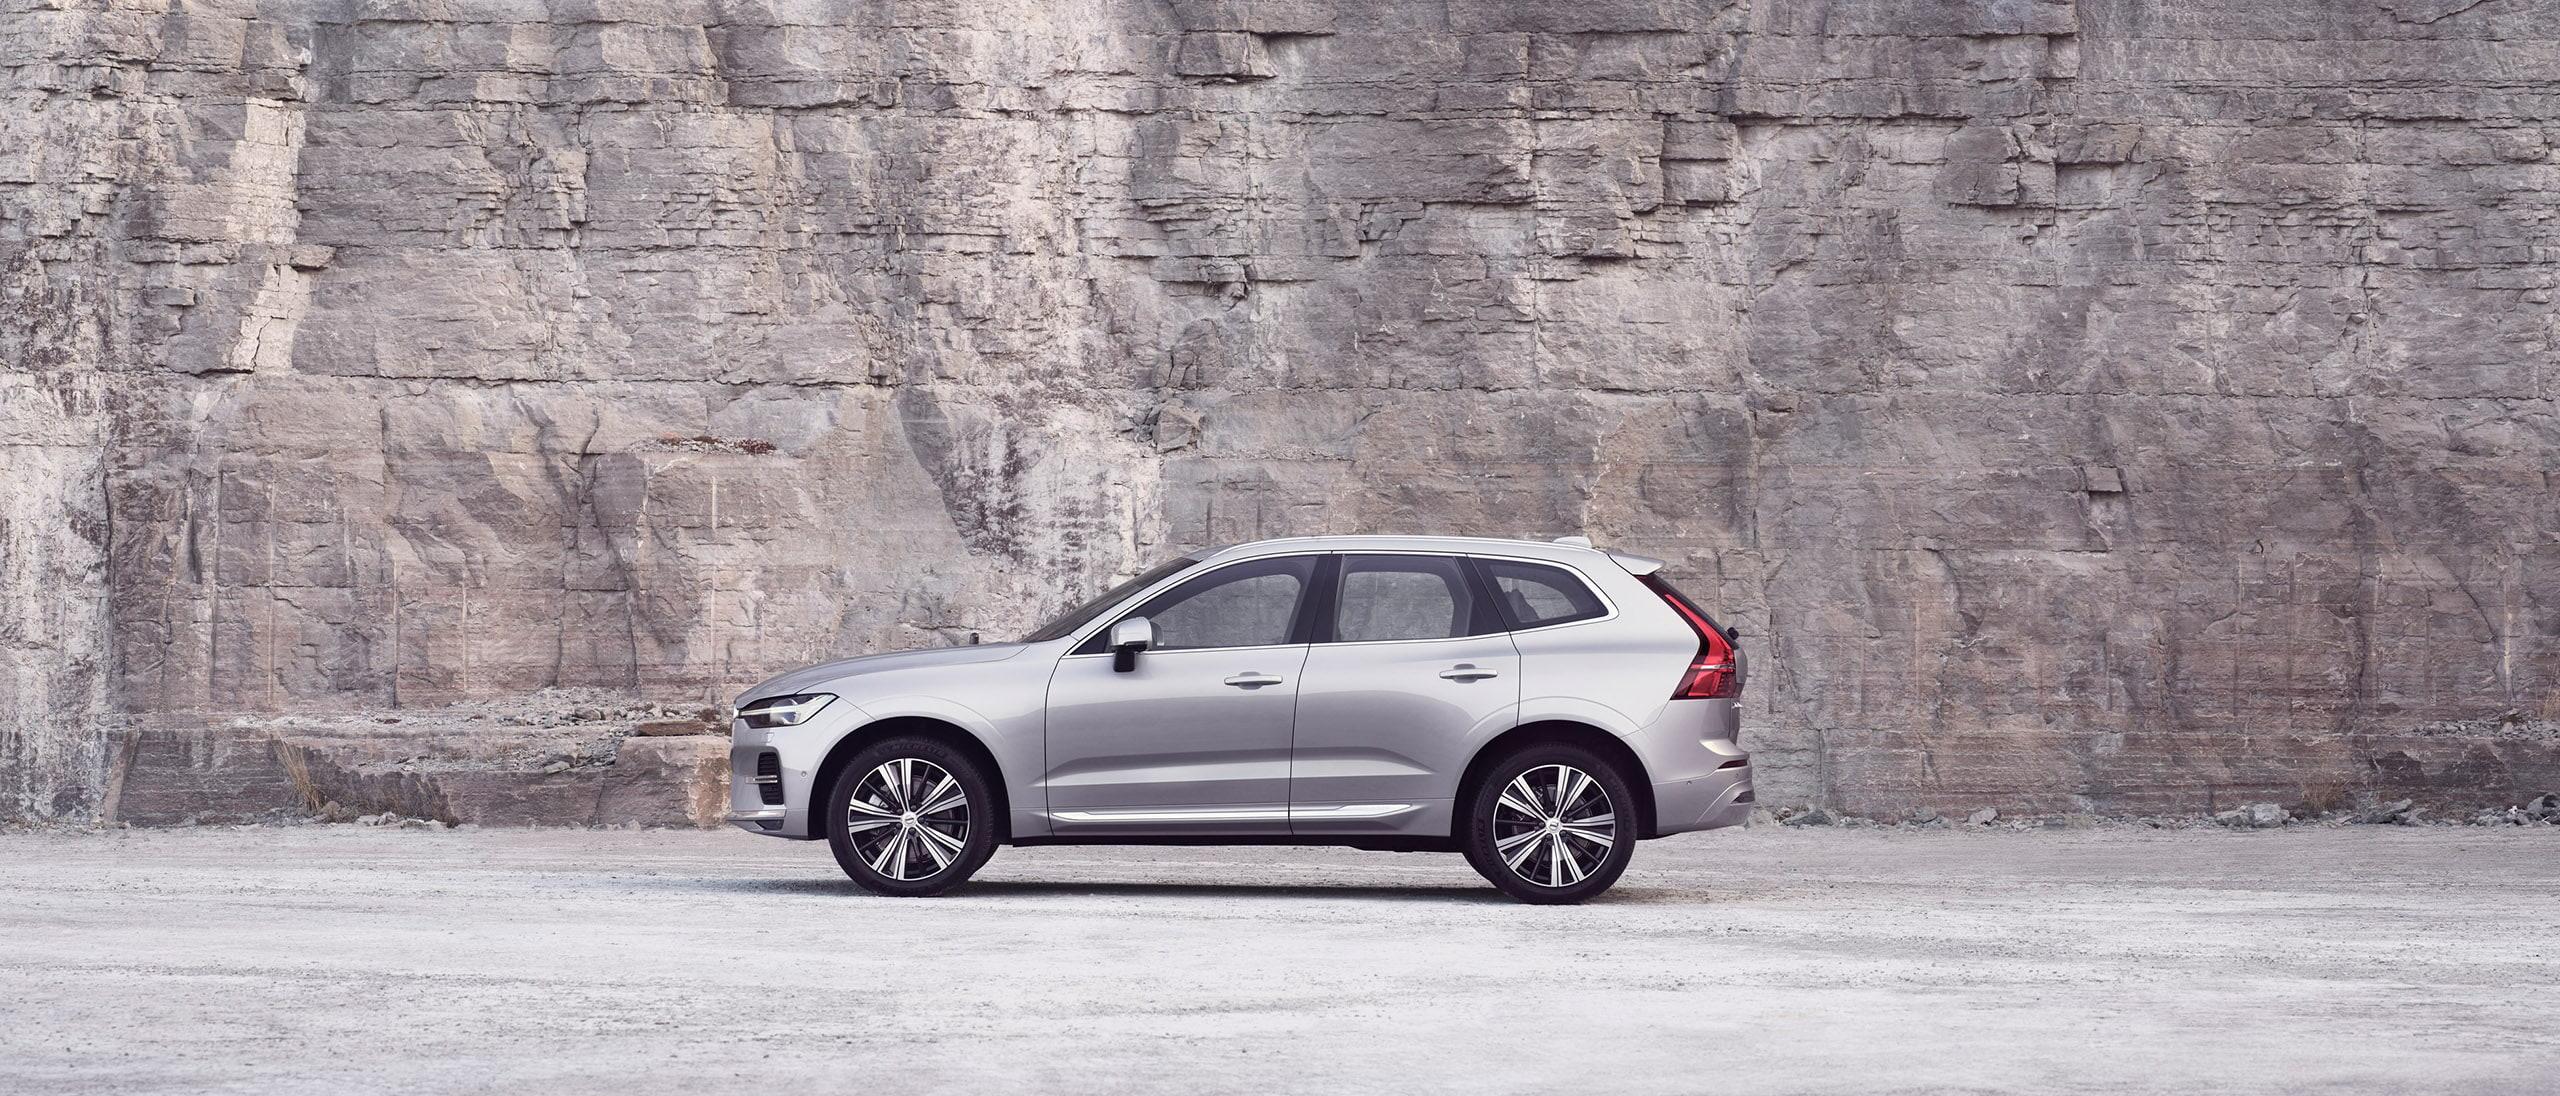 En sølvfarget Volvo XC60, parkert foran en fjellvegg.